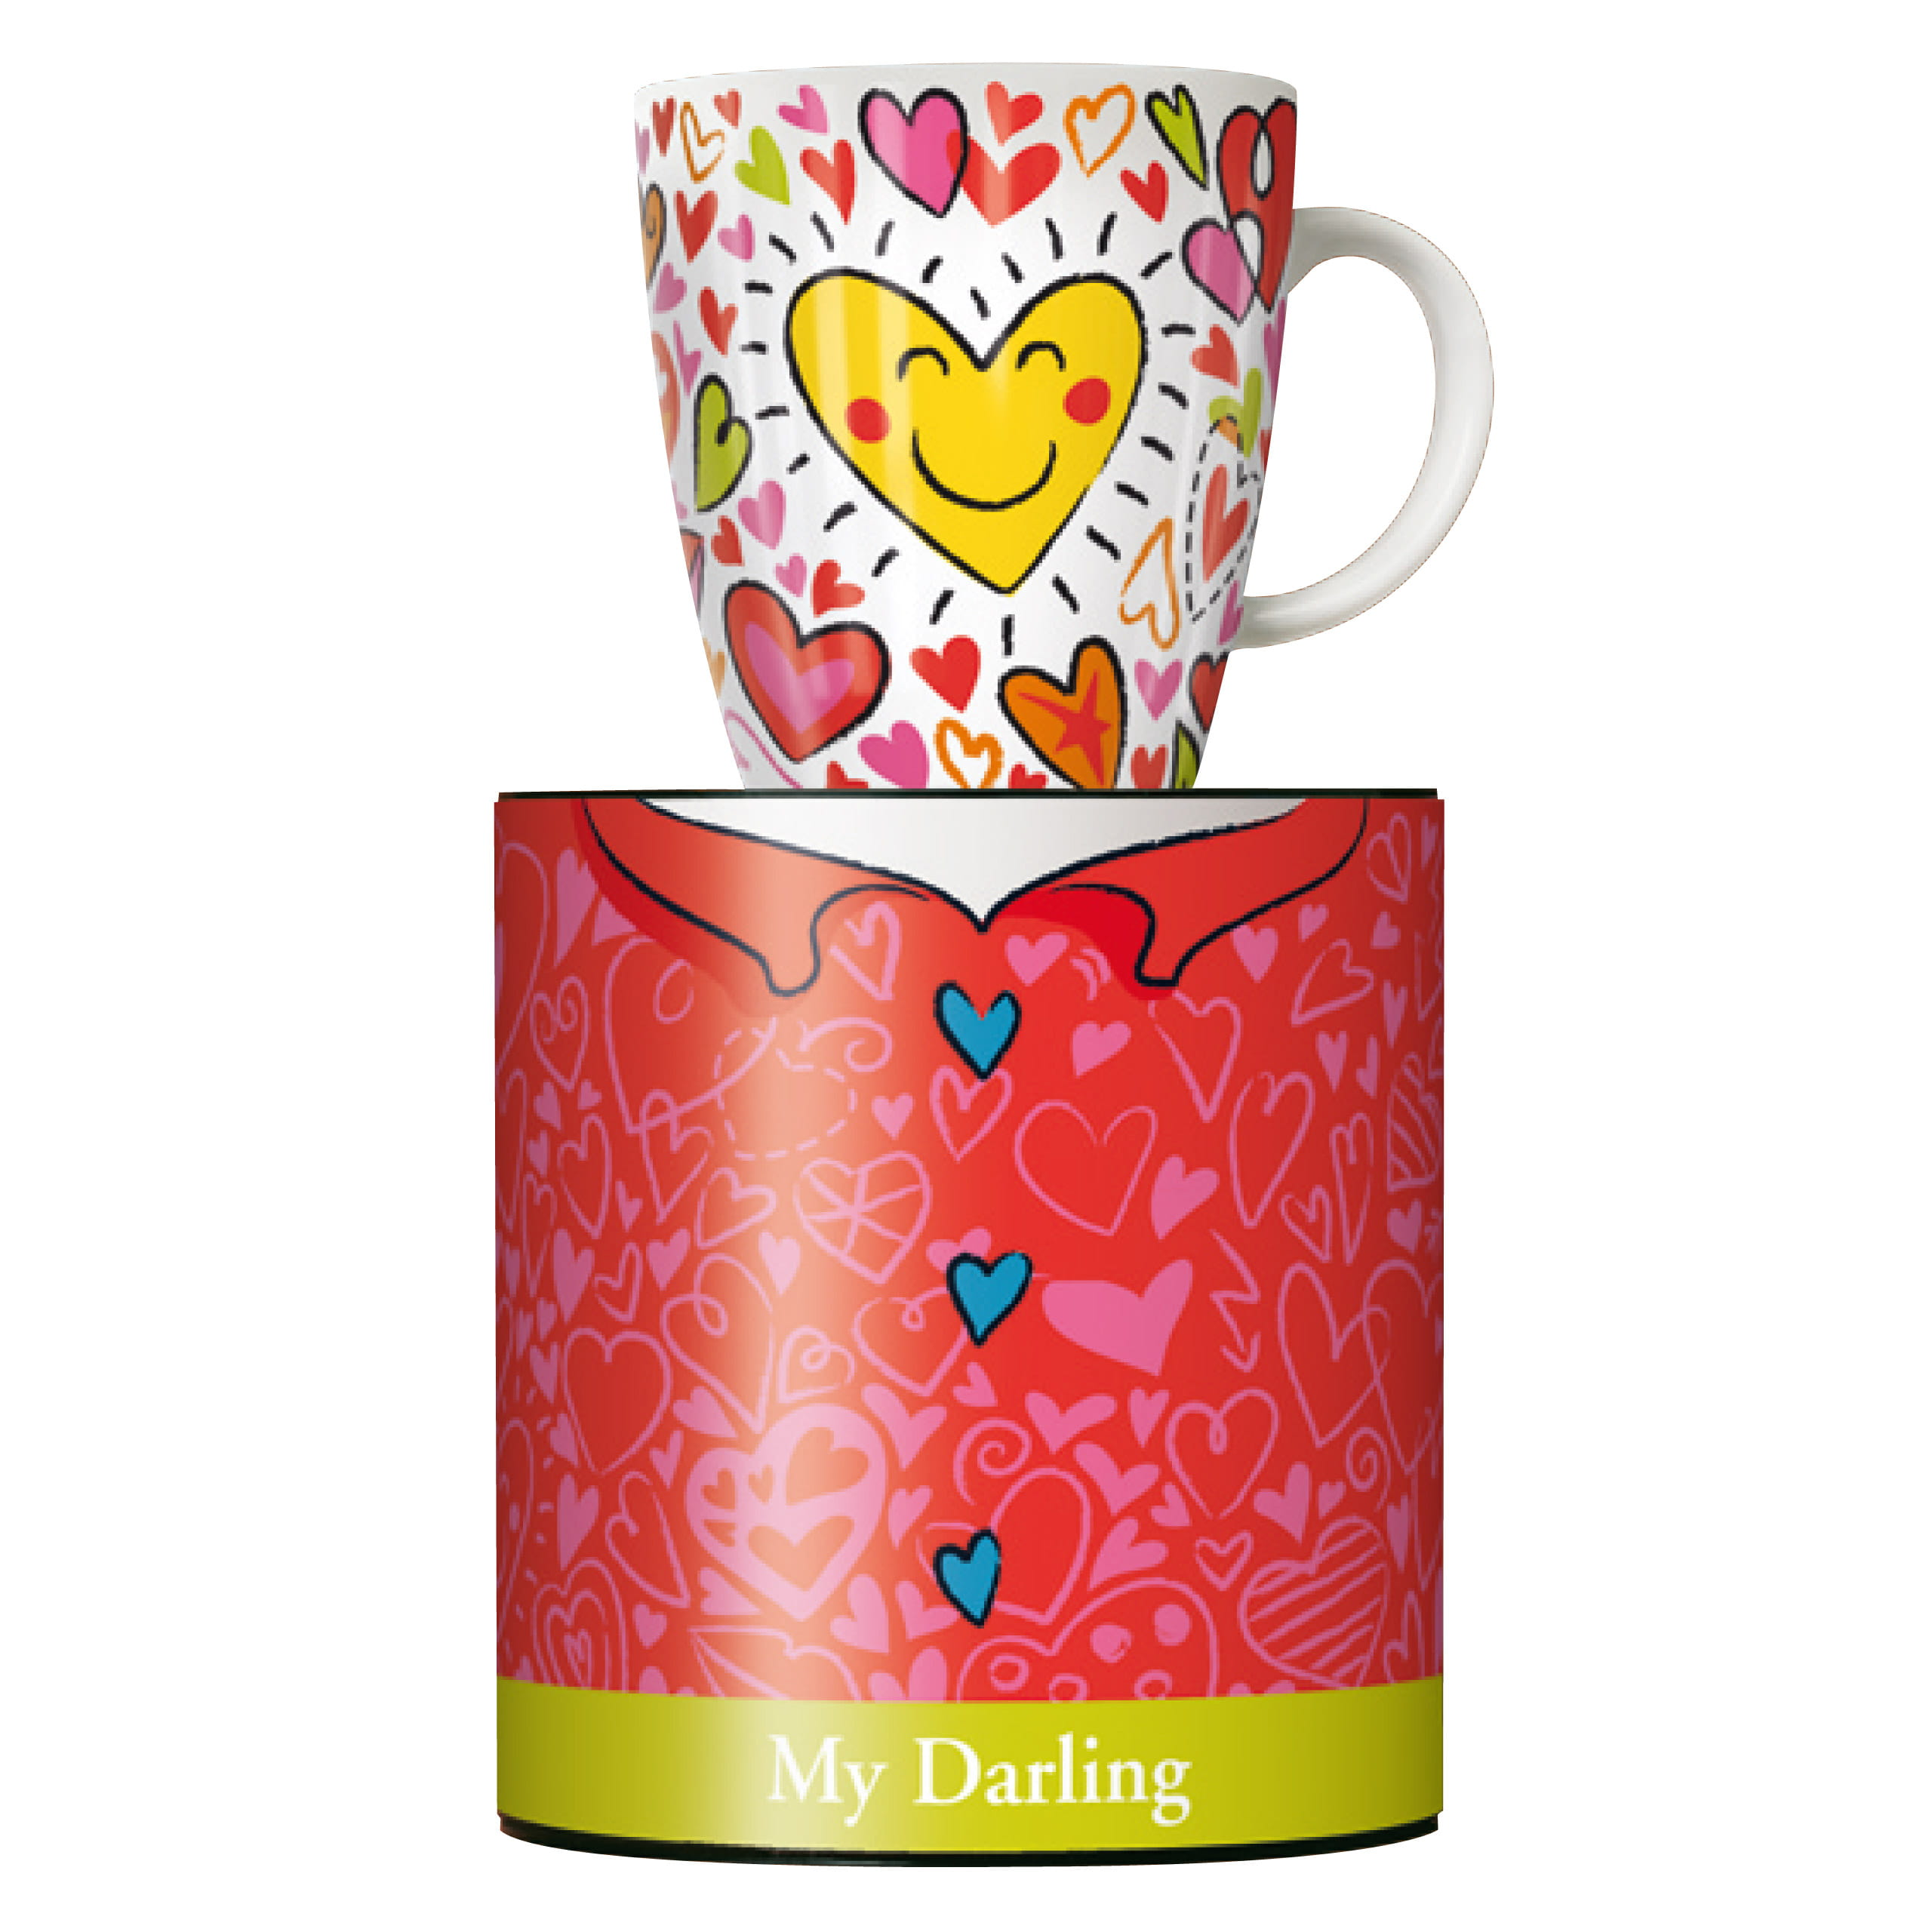 Martina Schlenke Frühjahr 20... Igel Ritzenhoff My Darling Kaffeebecher 0,3l